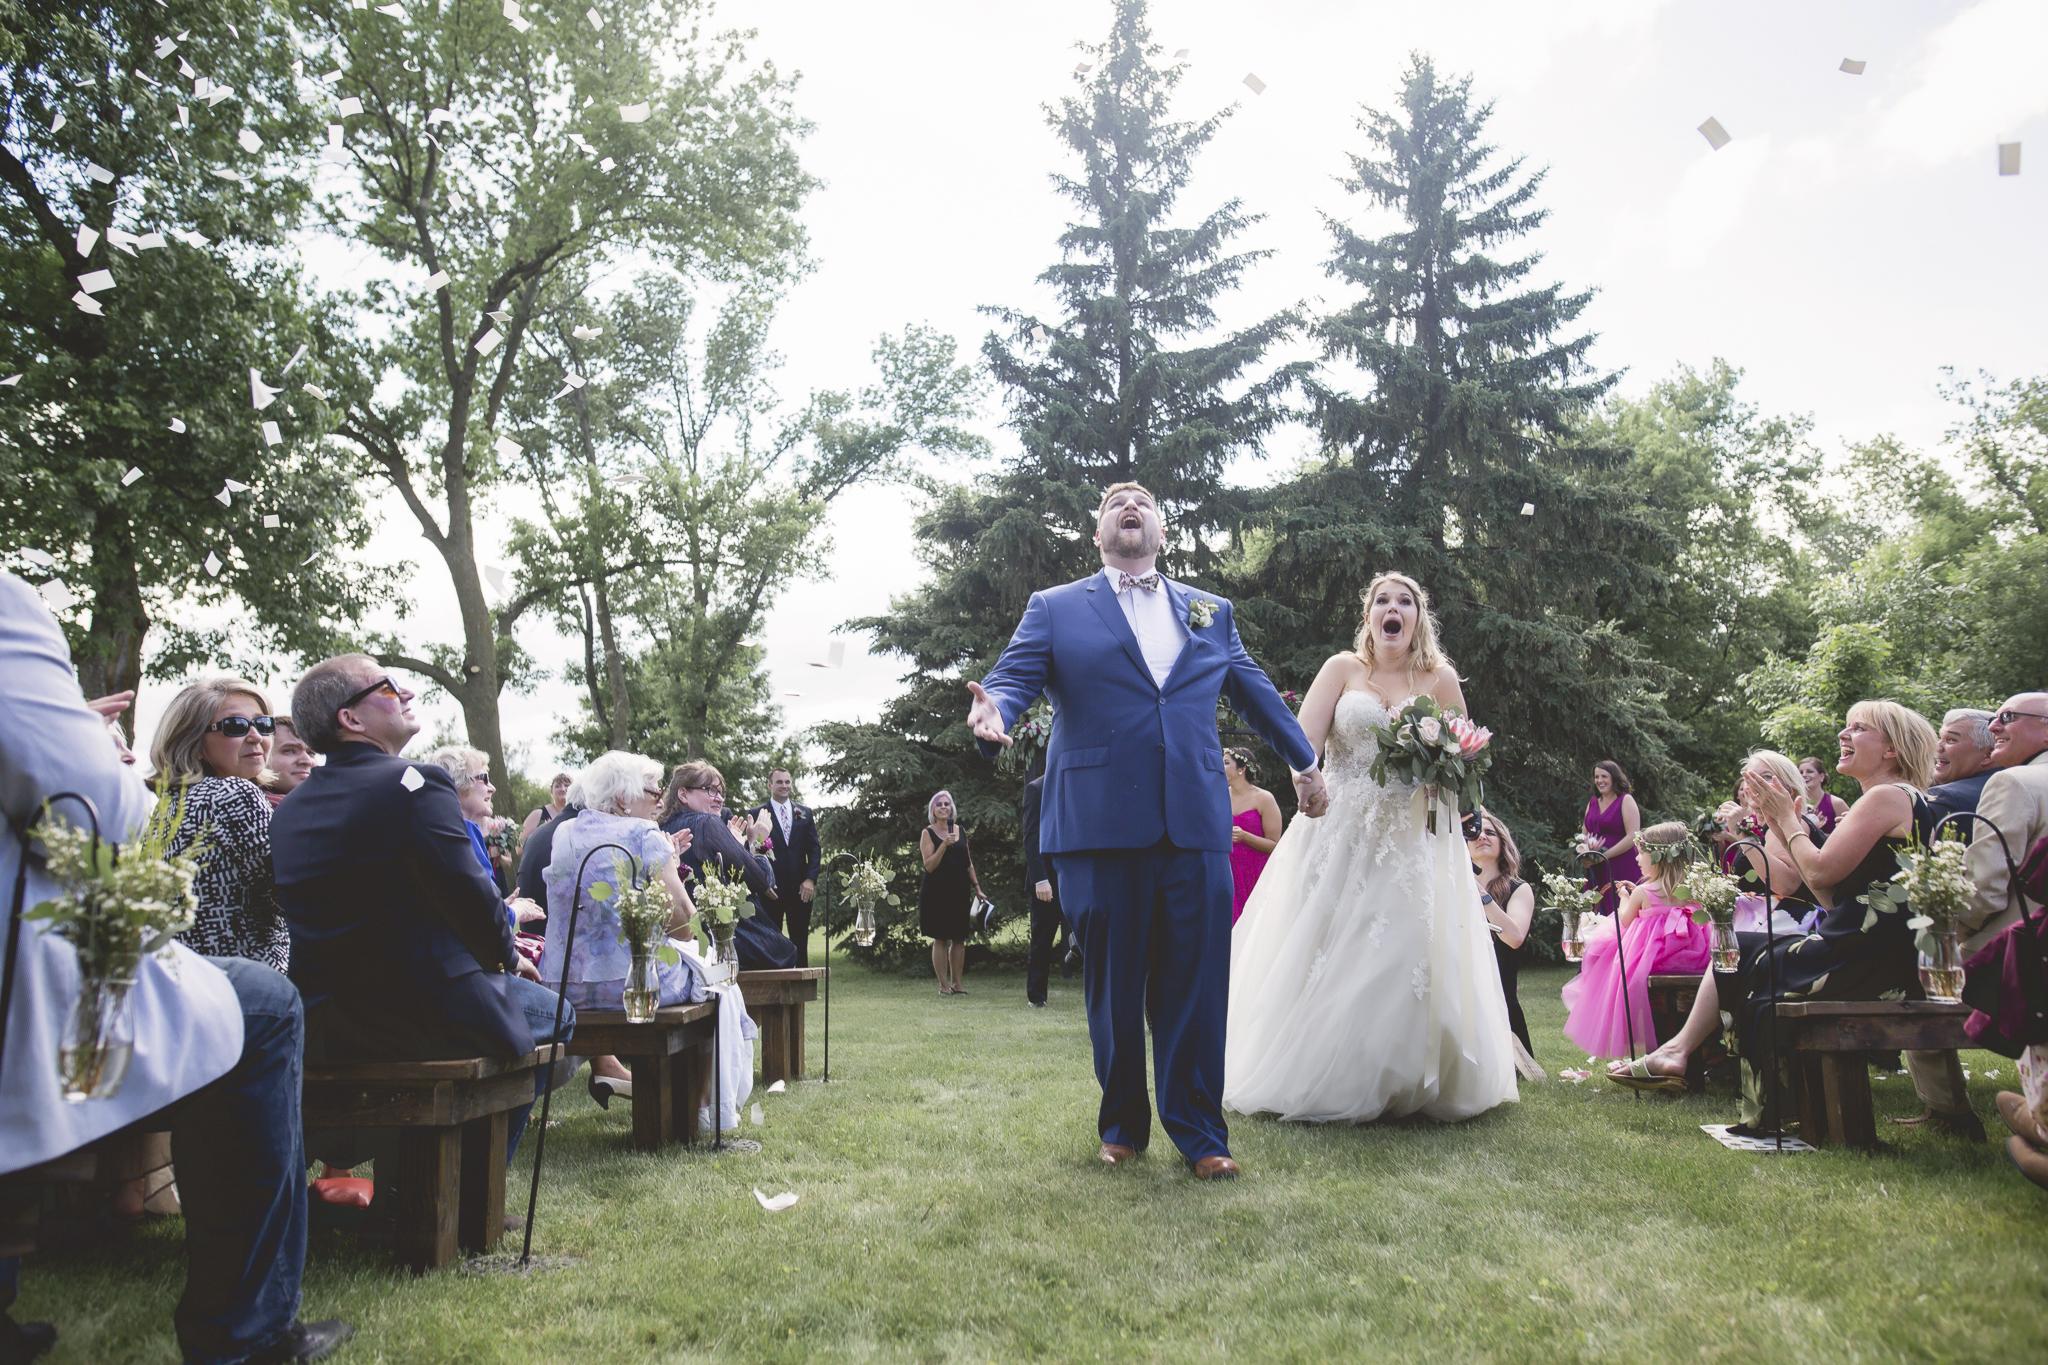 minnesota family farm outdoor wedding photographer-31.jpg